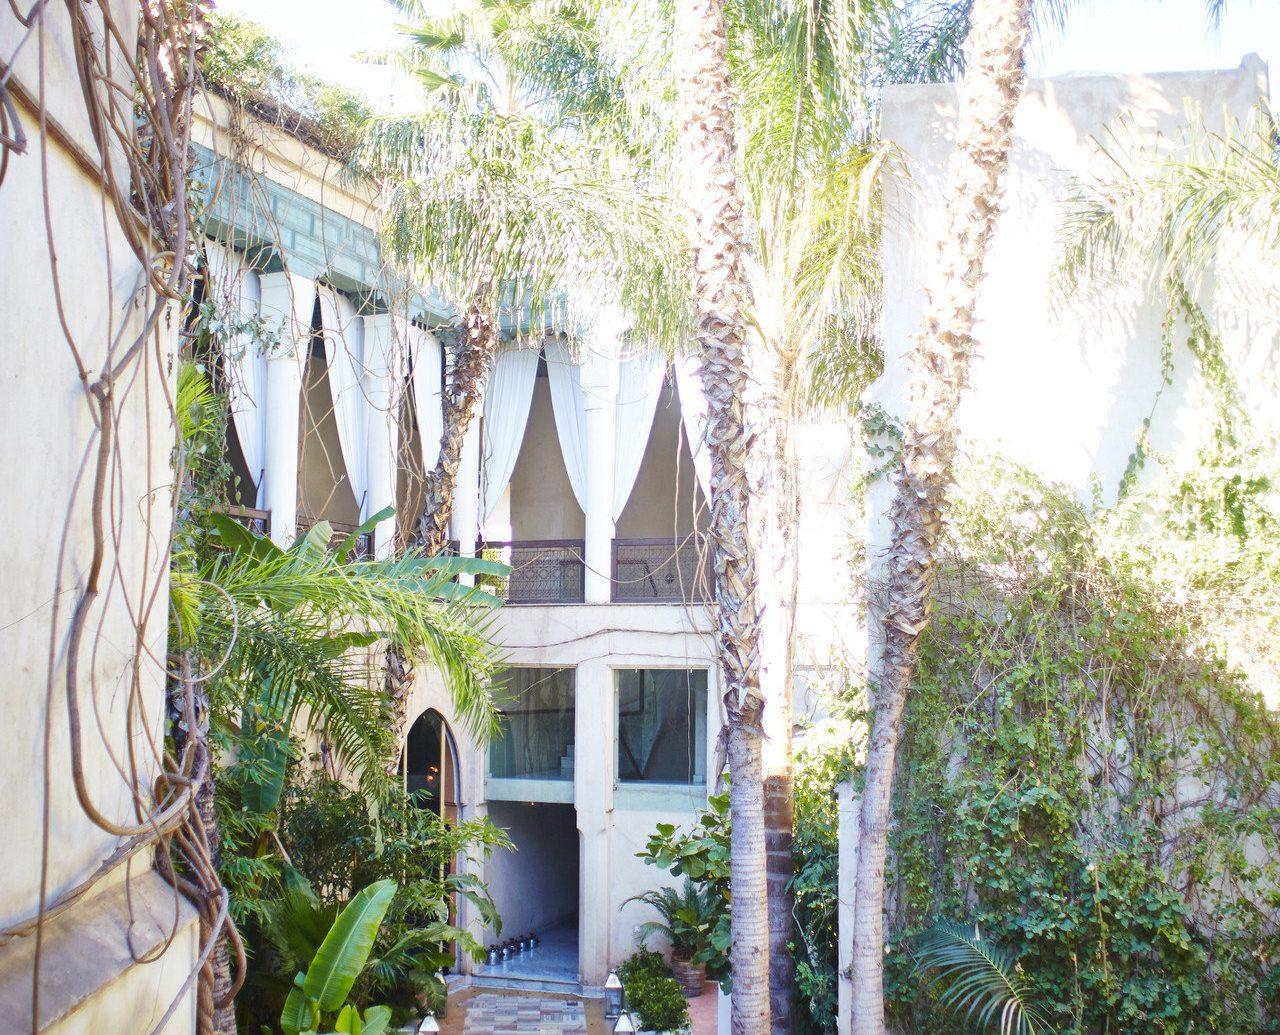 Influencers + Tastemakers Style + Design Travel Shop Trip Ideas tree property outdoor estate Courtyard Resort home hacienda mansion Villa Garden plant backyard